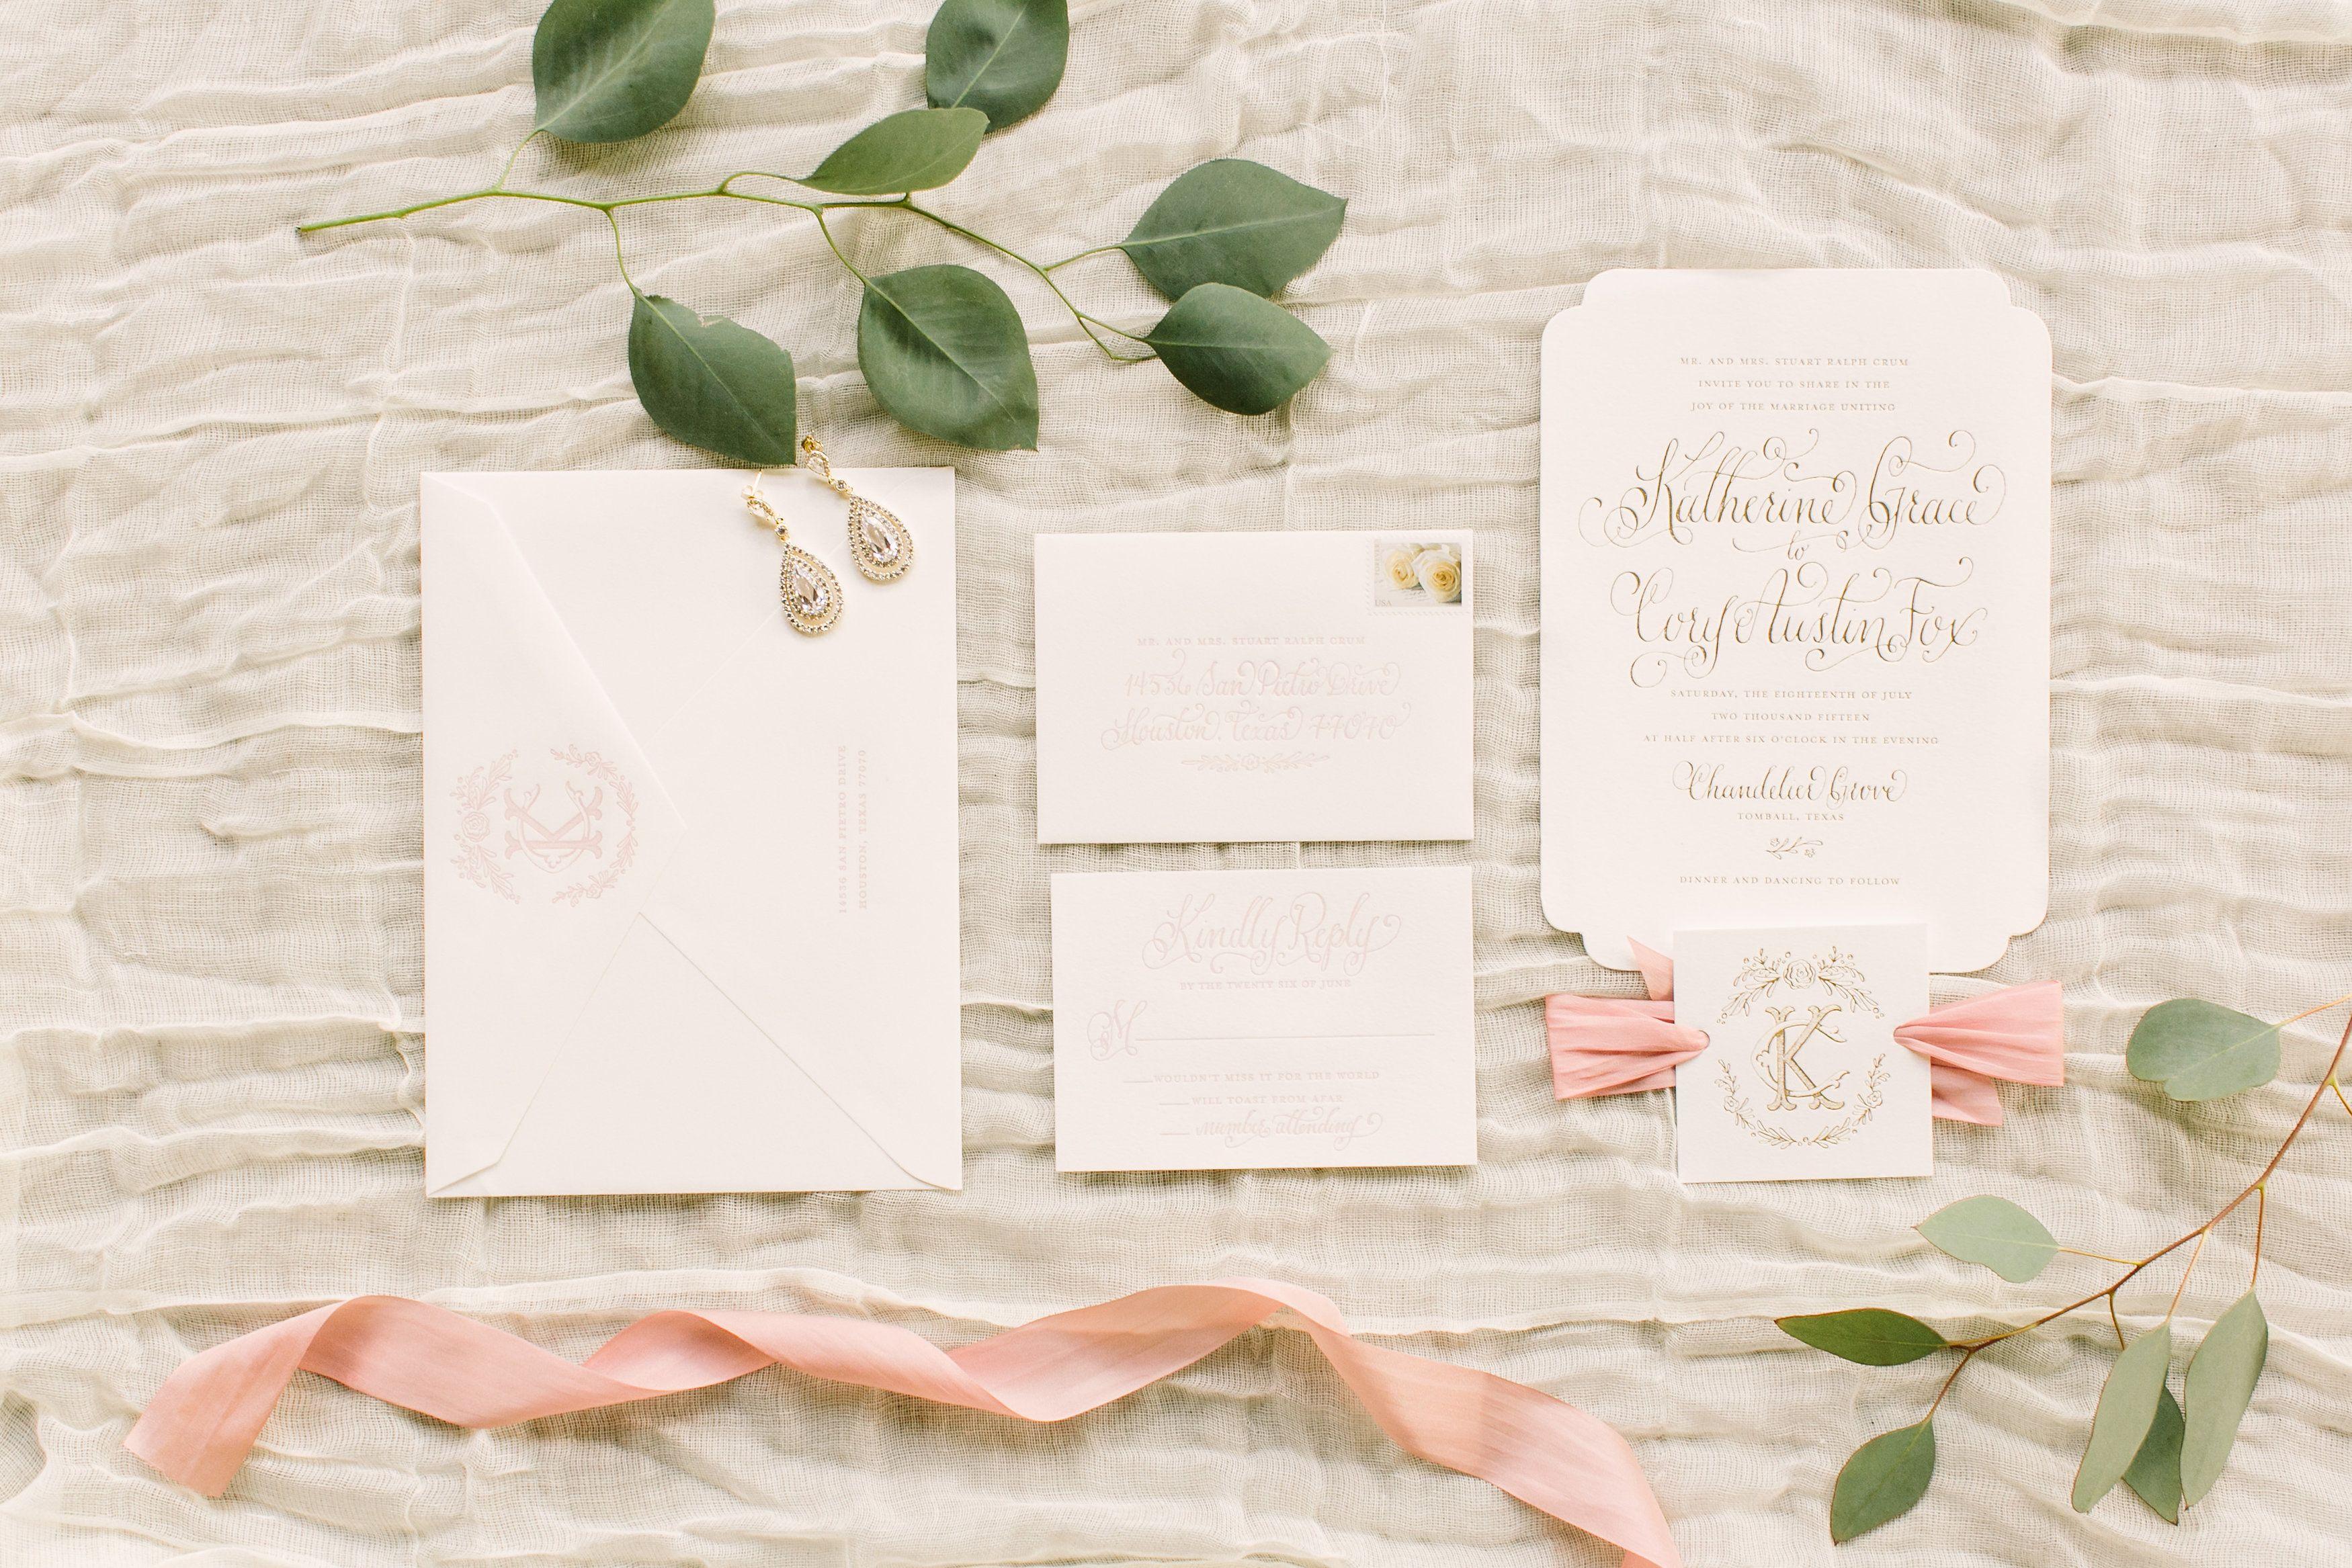 houston tx wedding planner